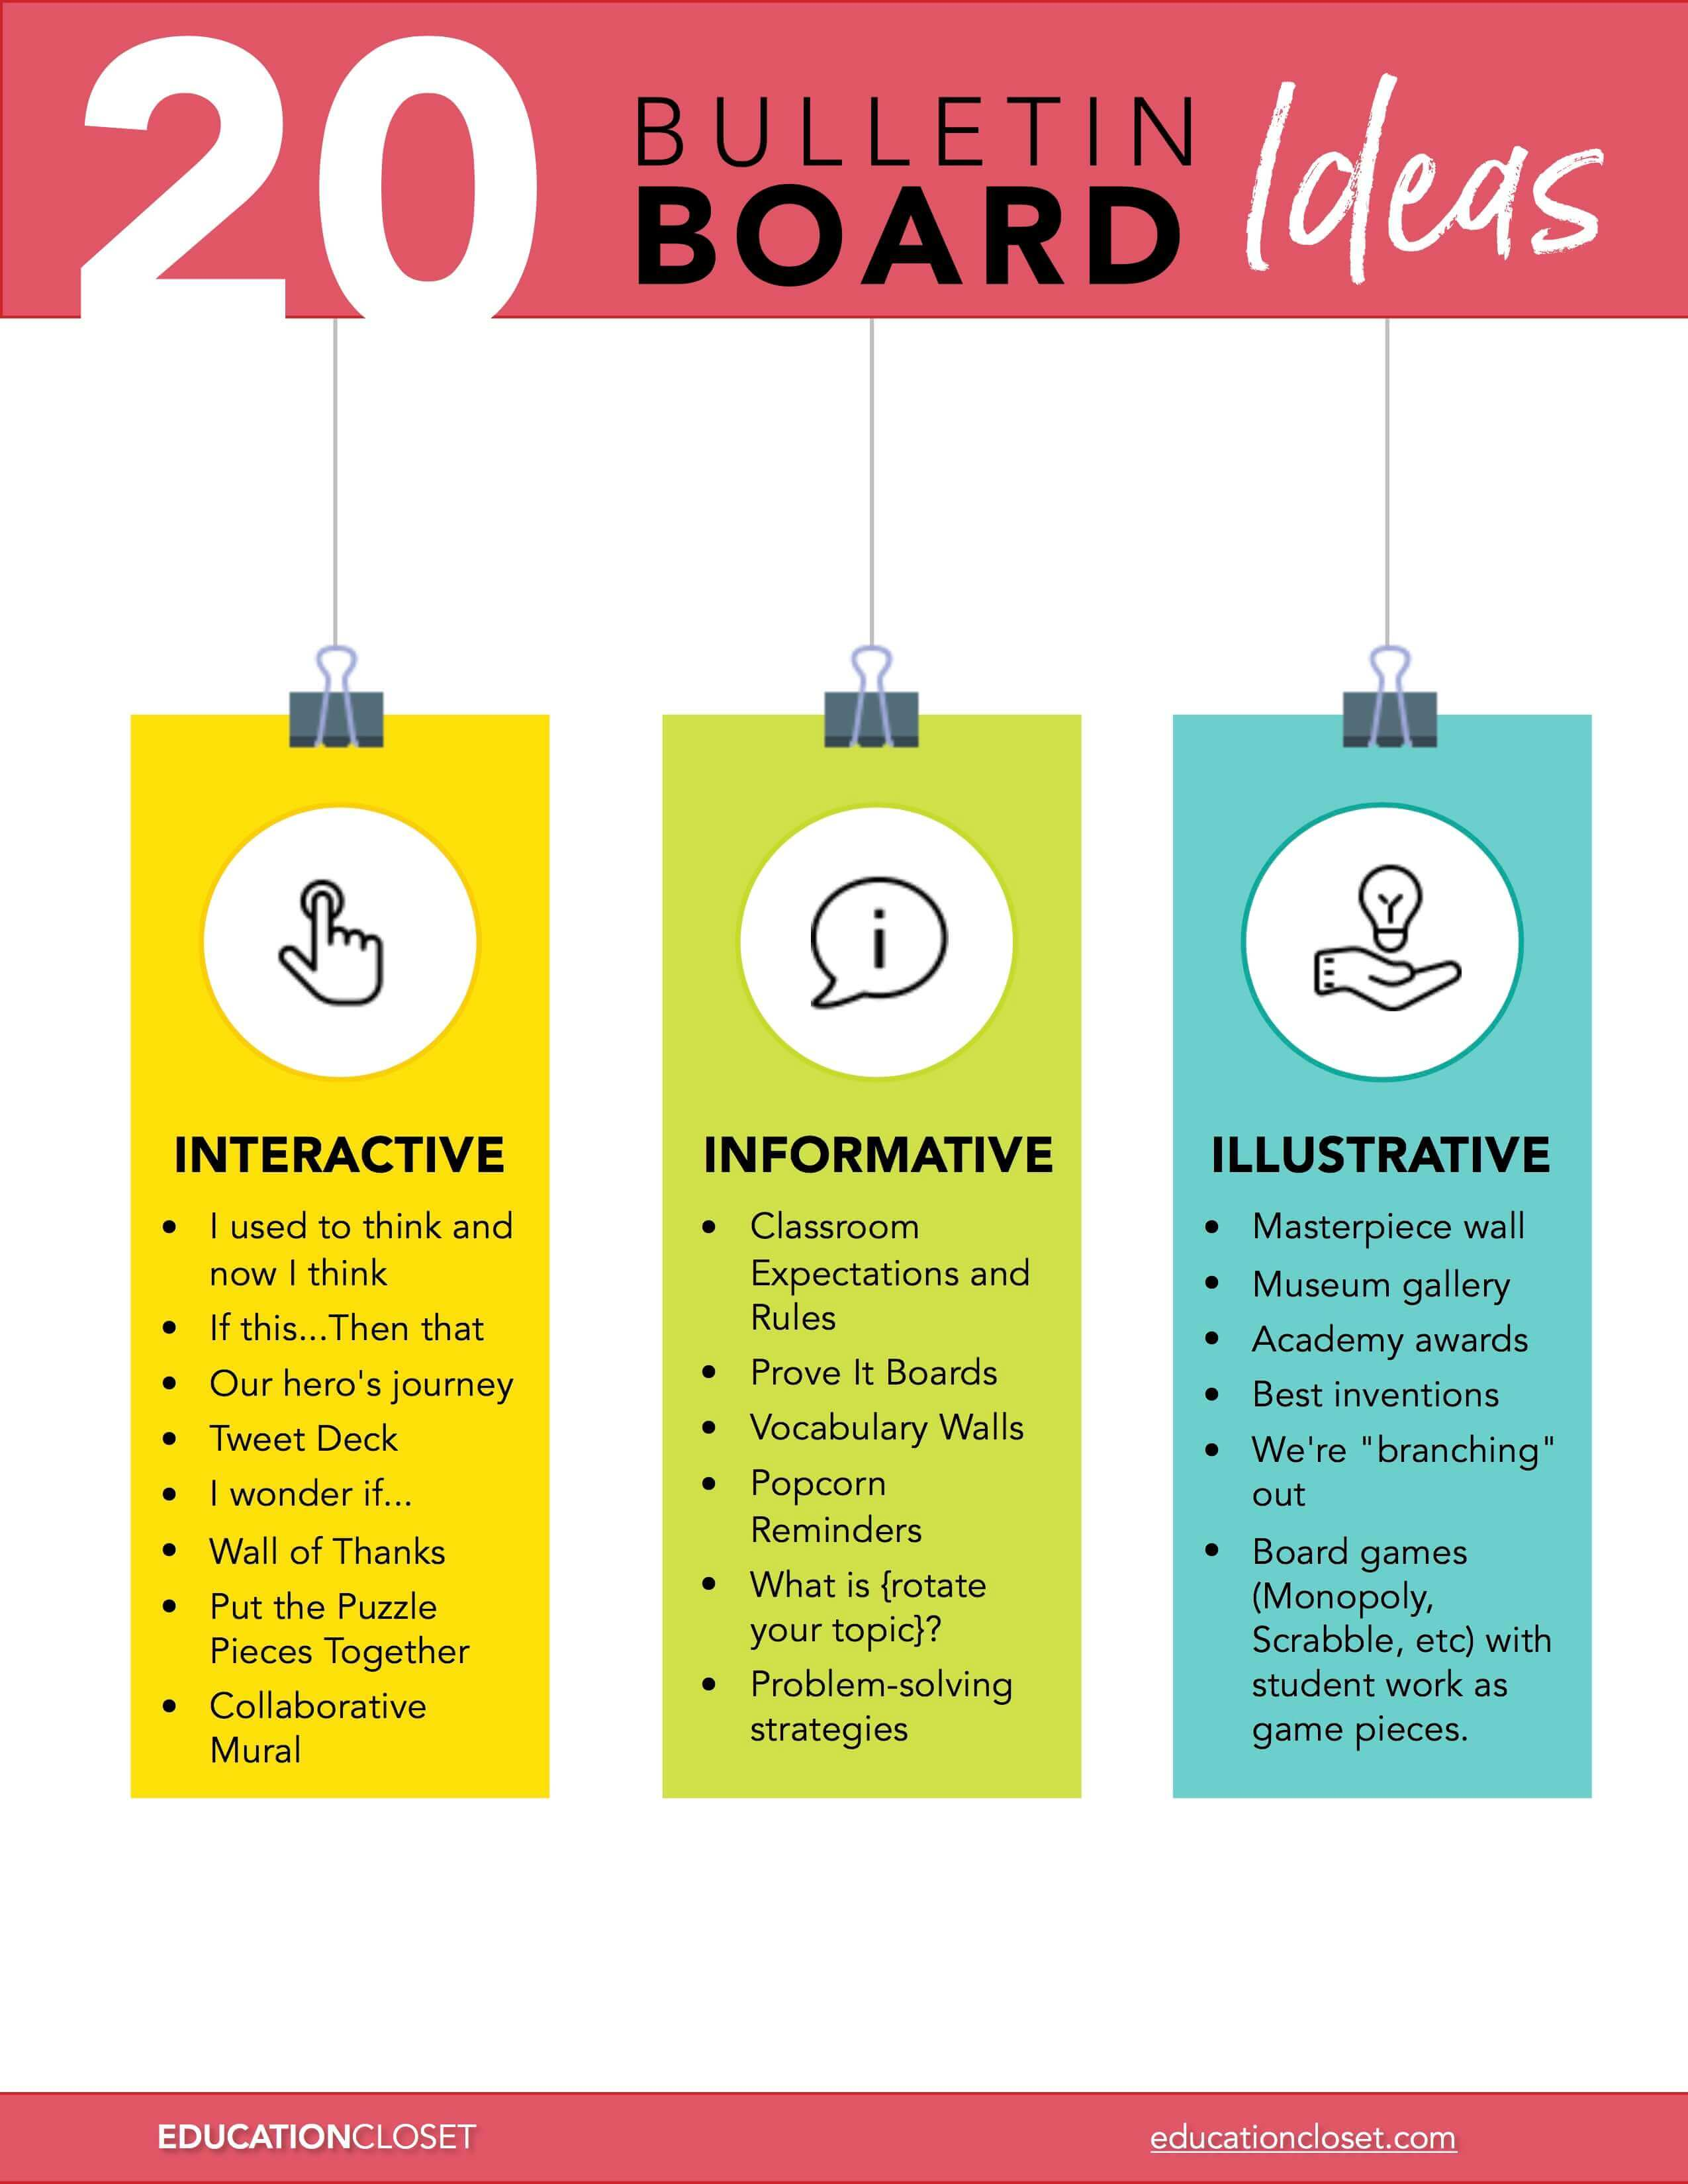 Effective Bulletin Board Ideas for Teachers | Education Closet